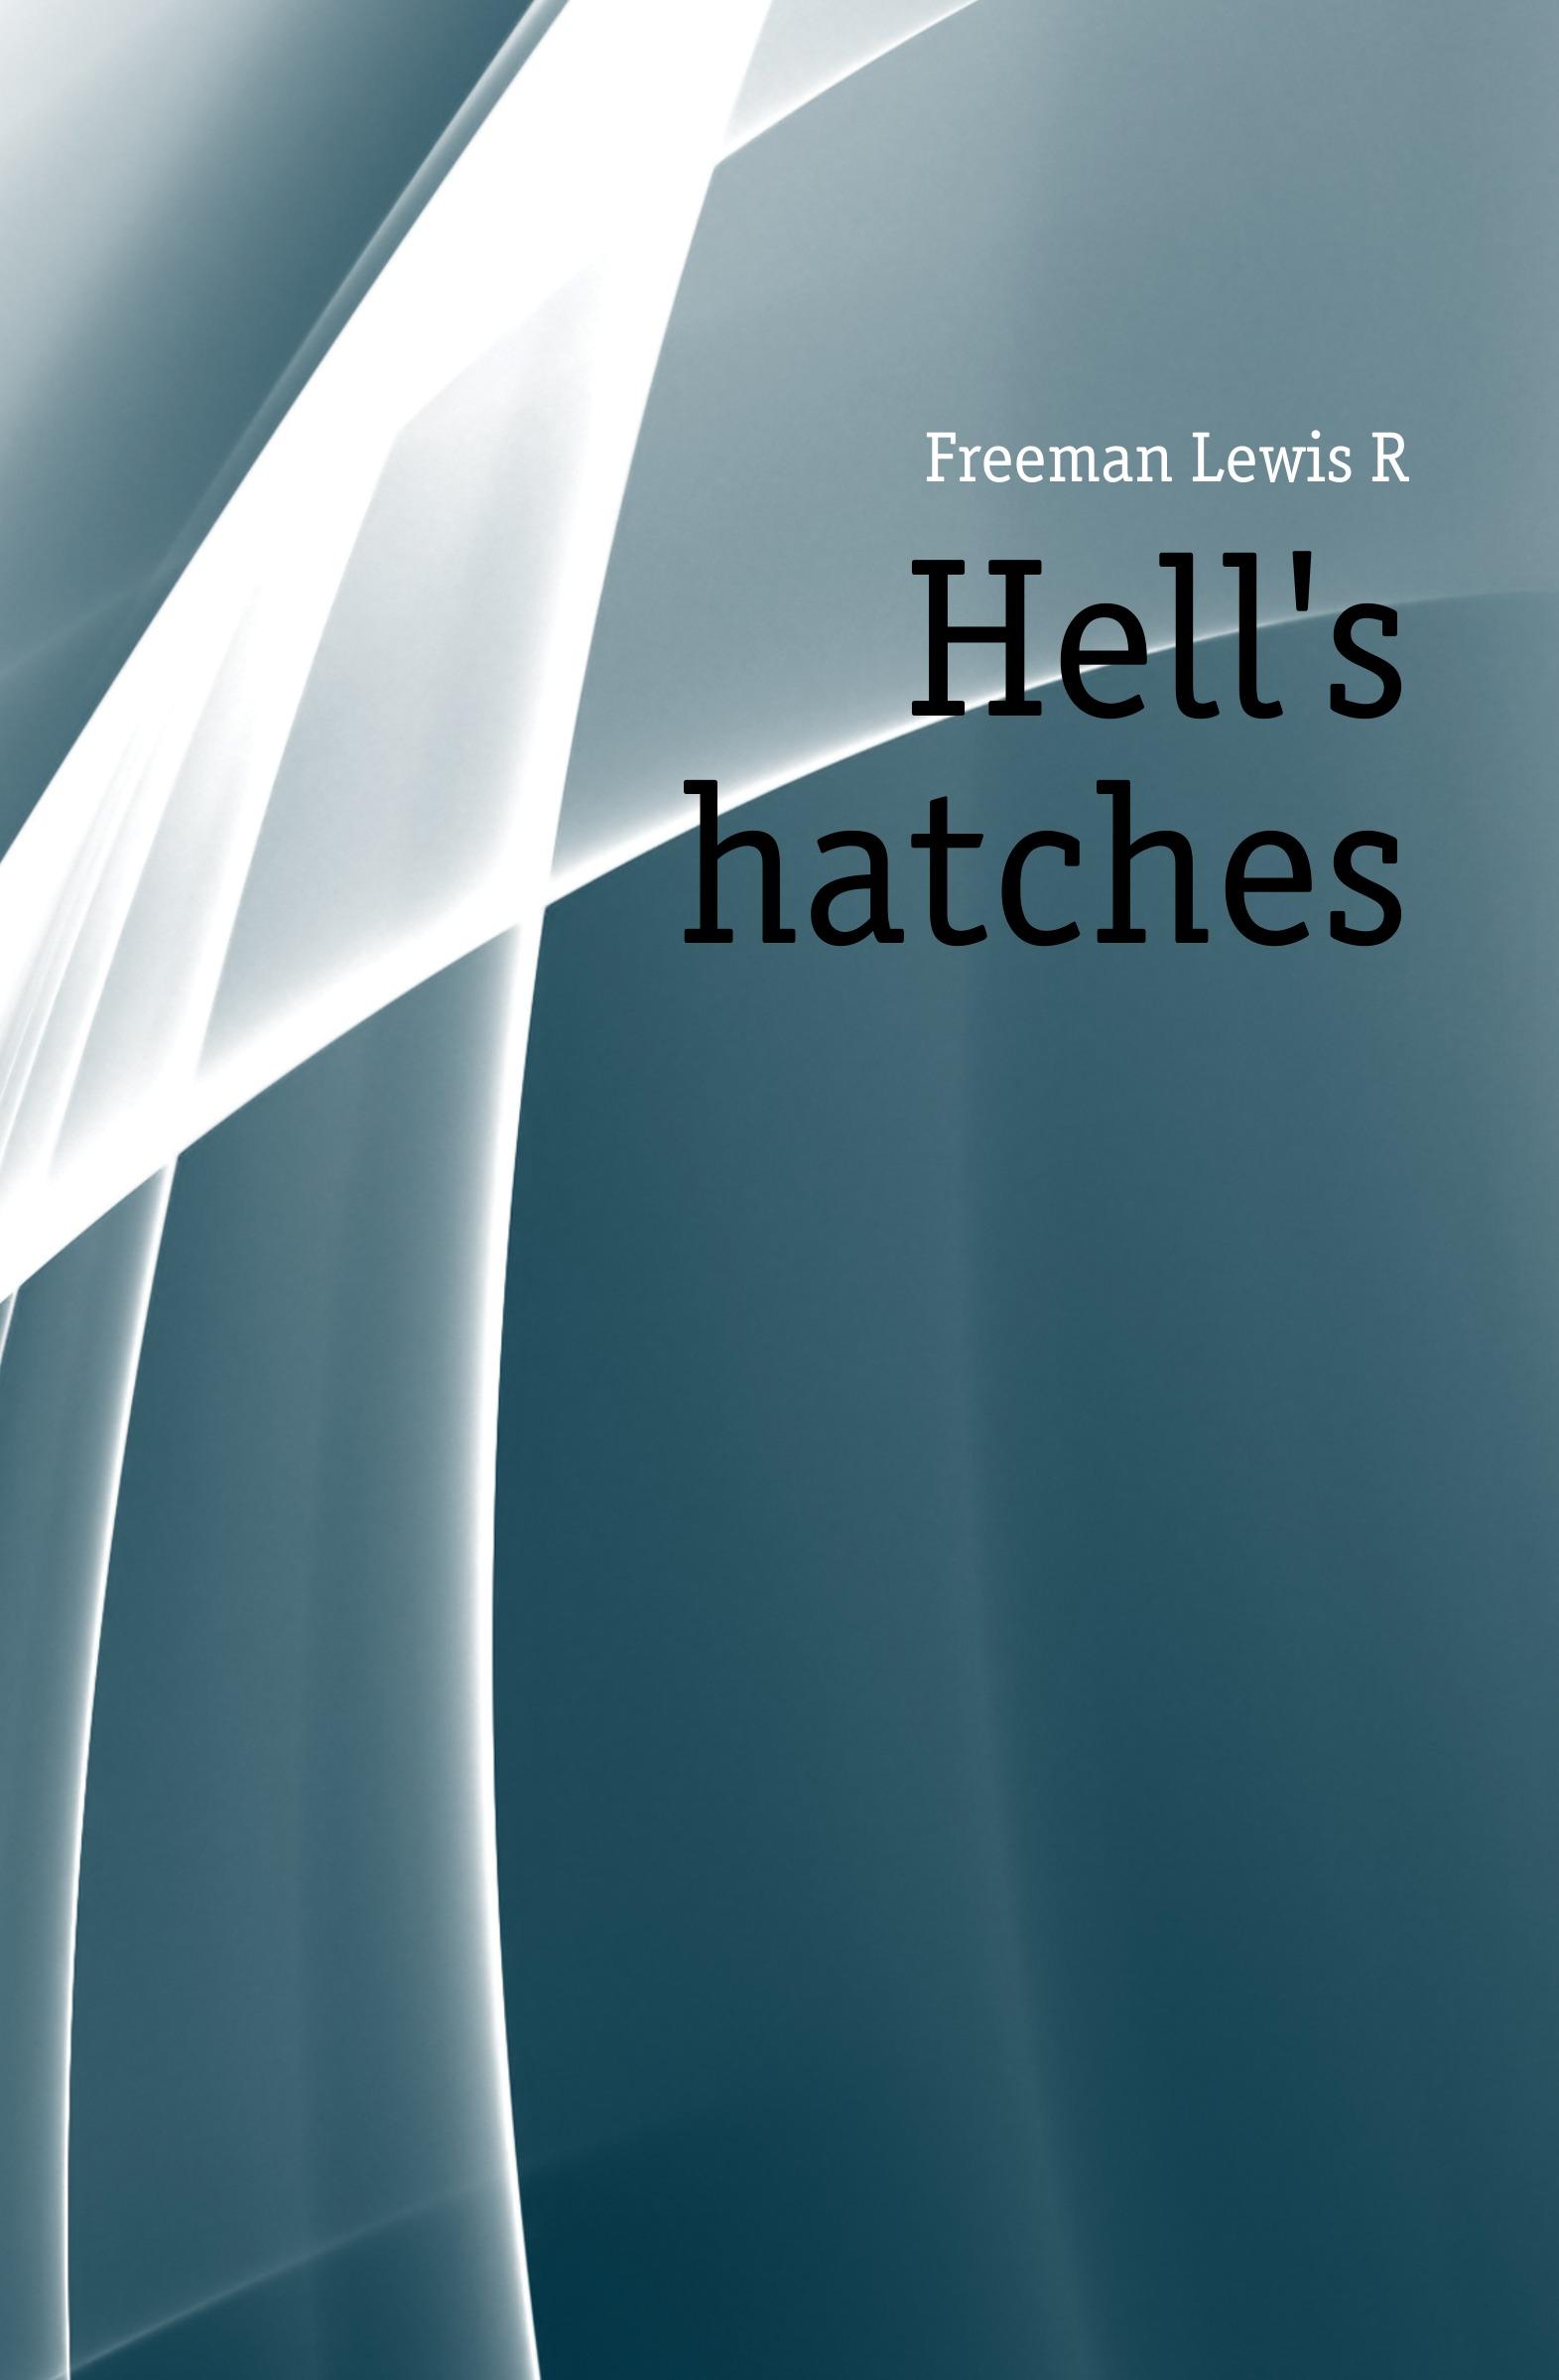 Freeman Lewis R. Hells hatches r austin freeman osirise silm